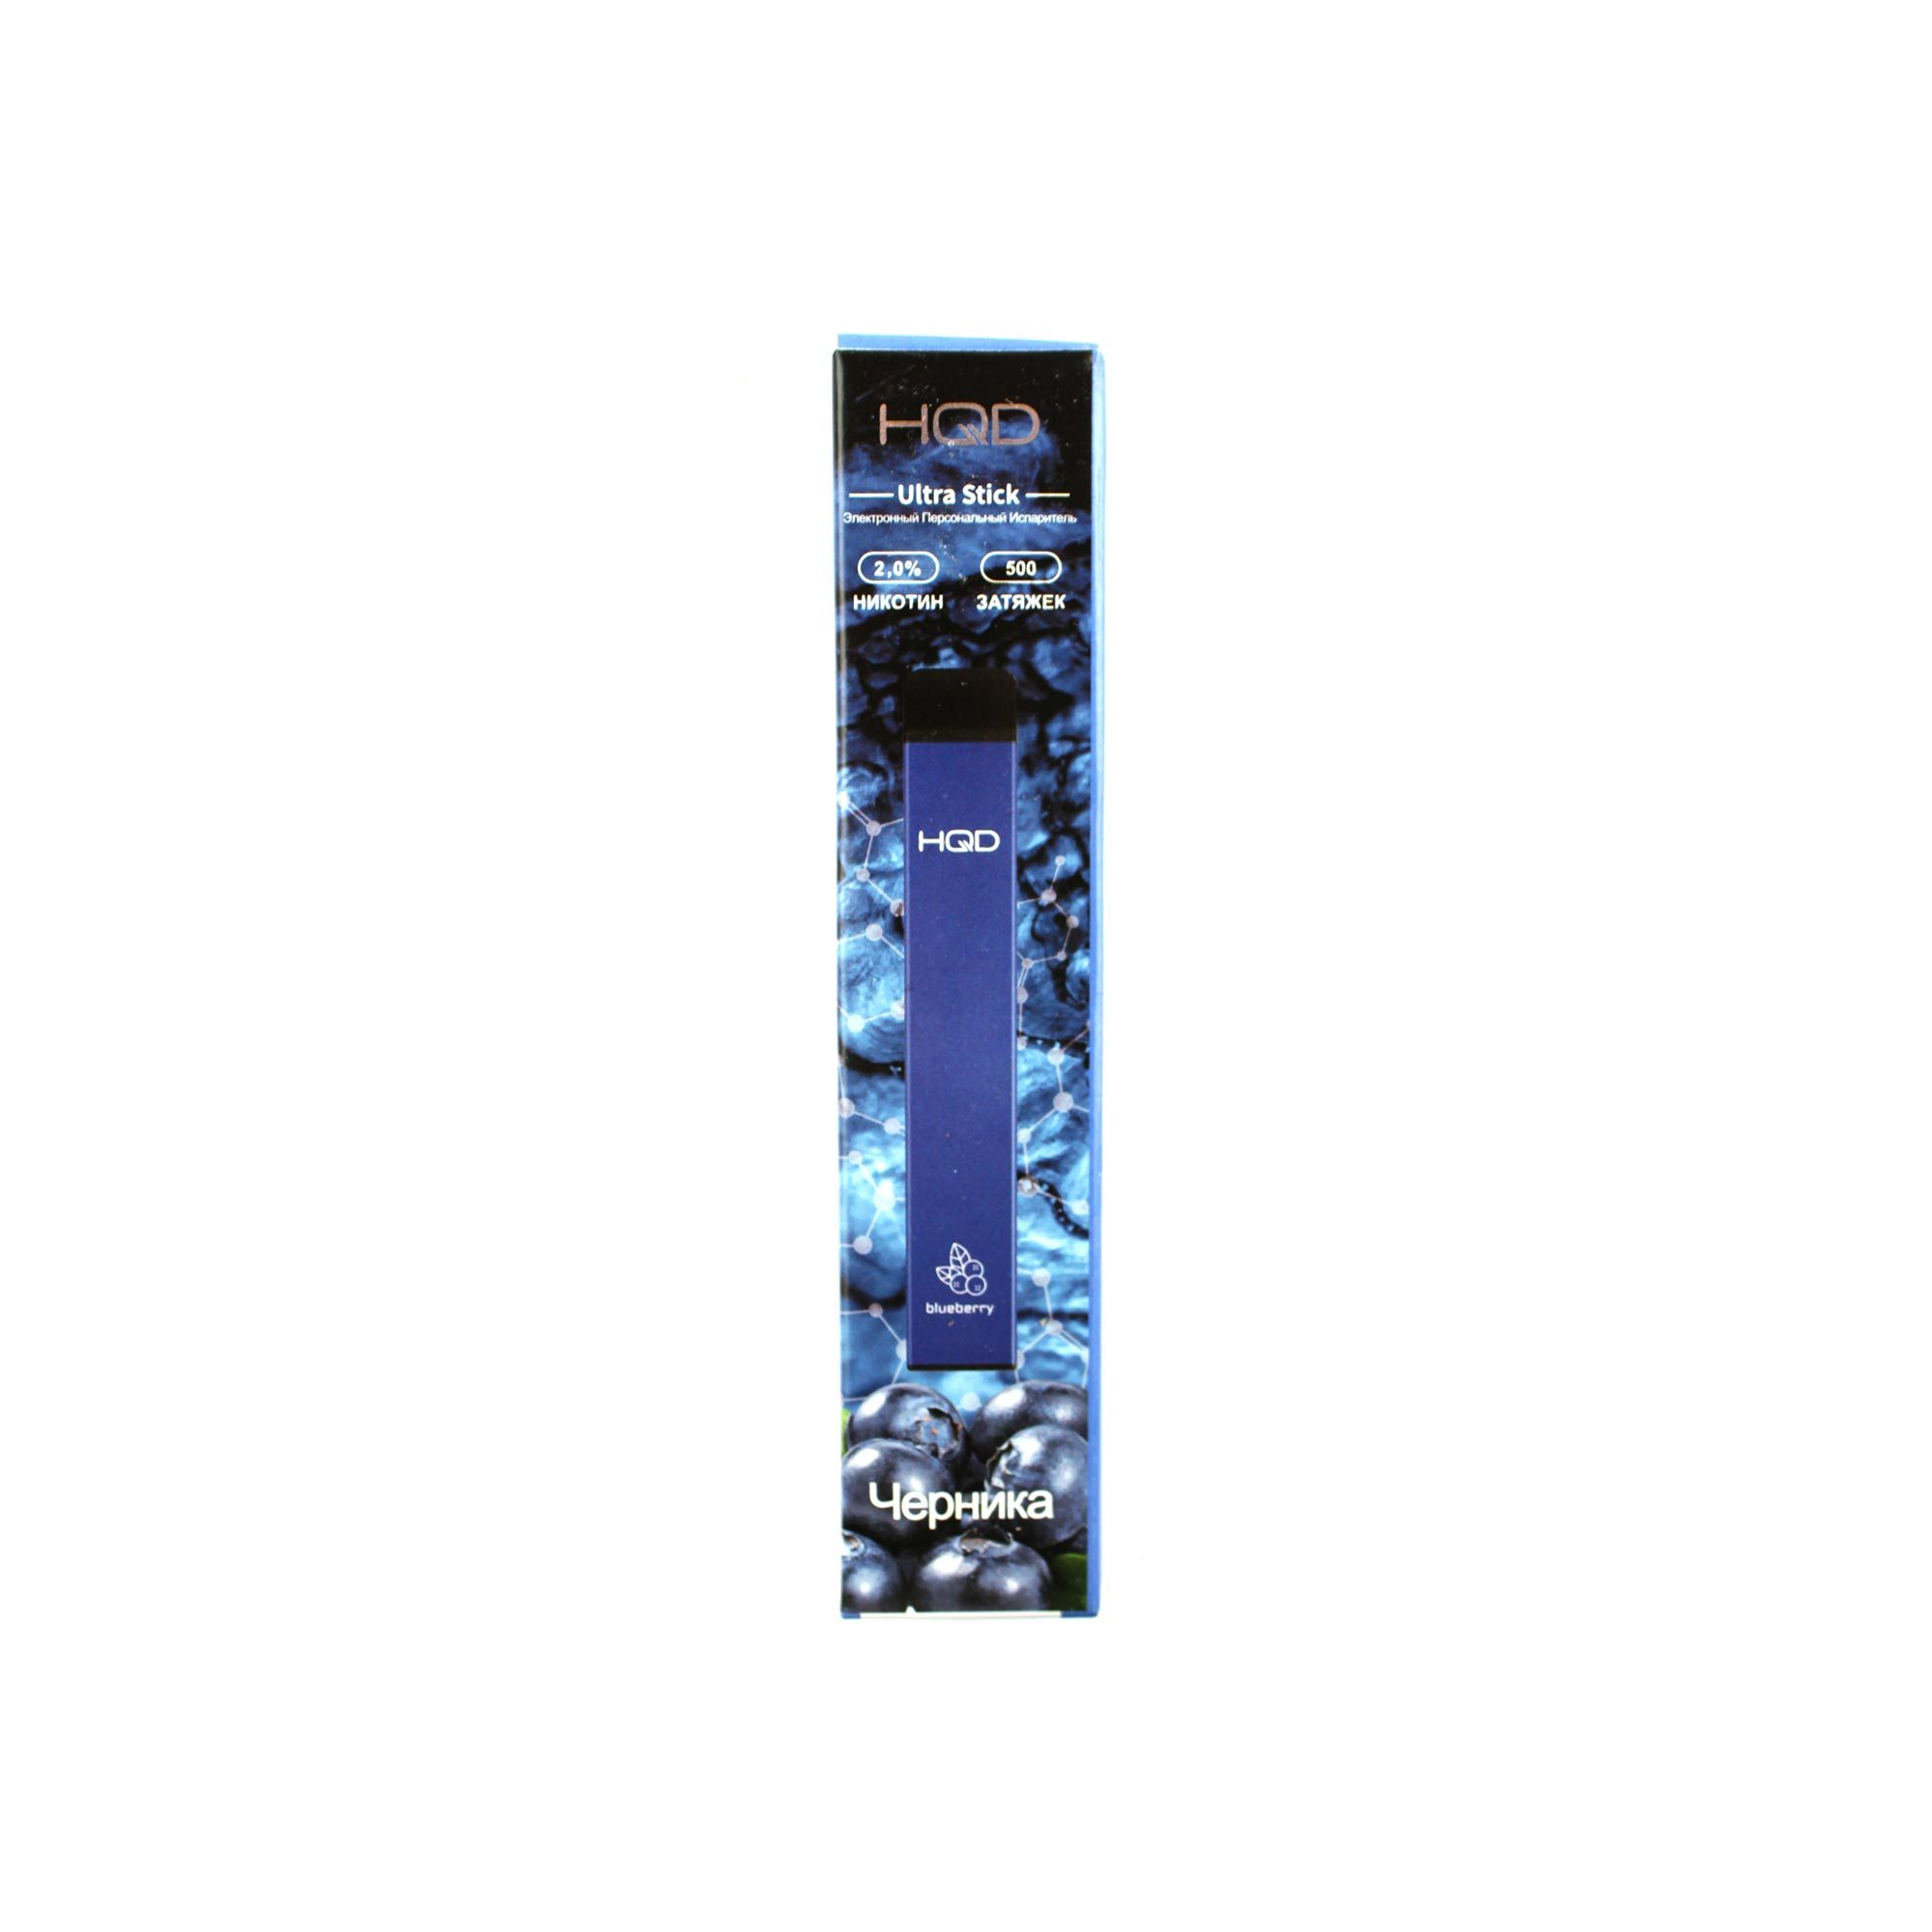 Одноразовая электронная сигарета HQD Ultra Blueberry (Черника)